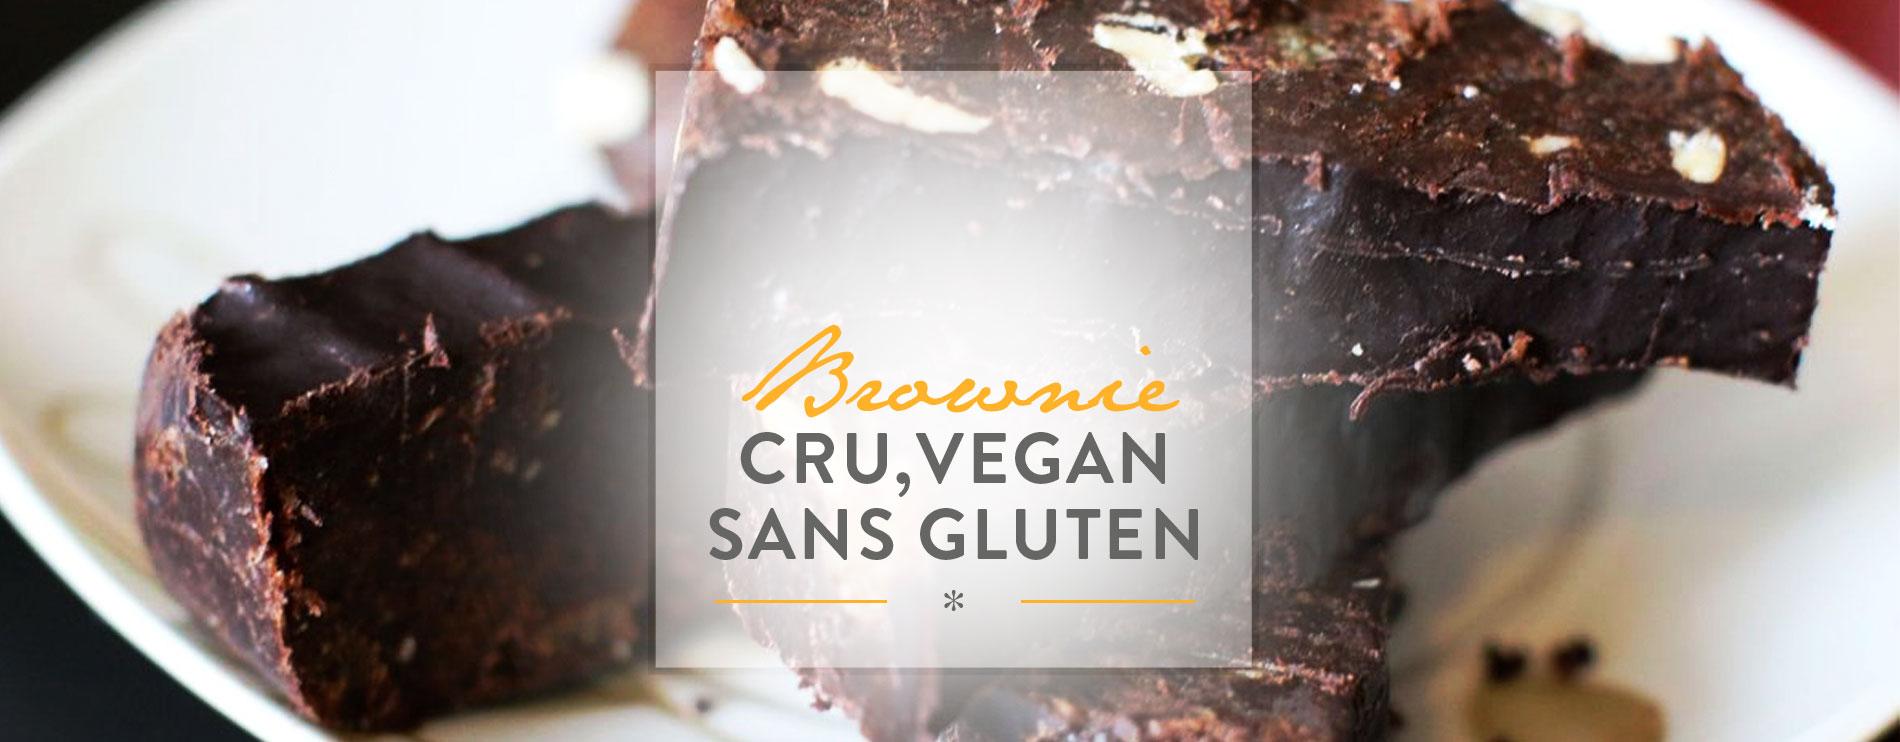 westwing-Brownie fondant, cru, vegan et sans gluten